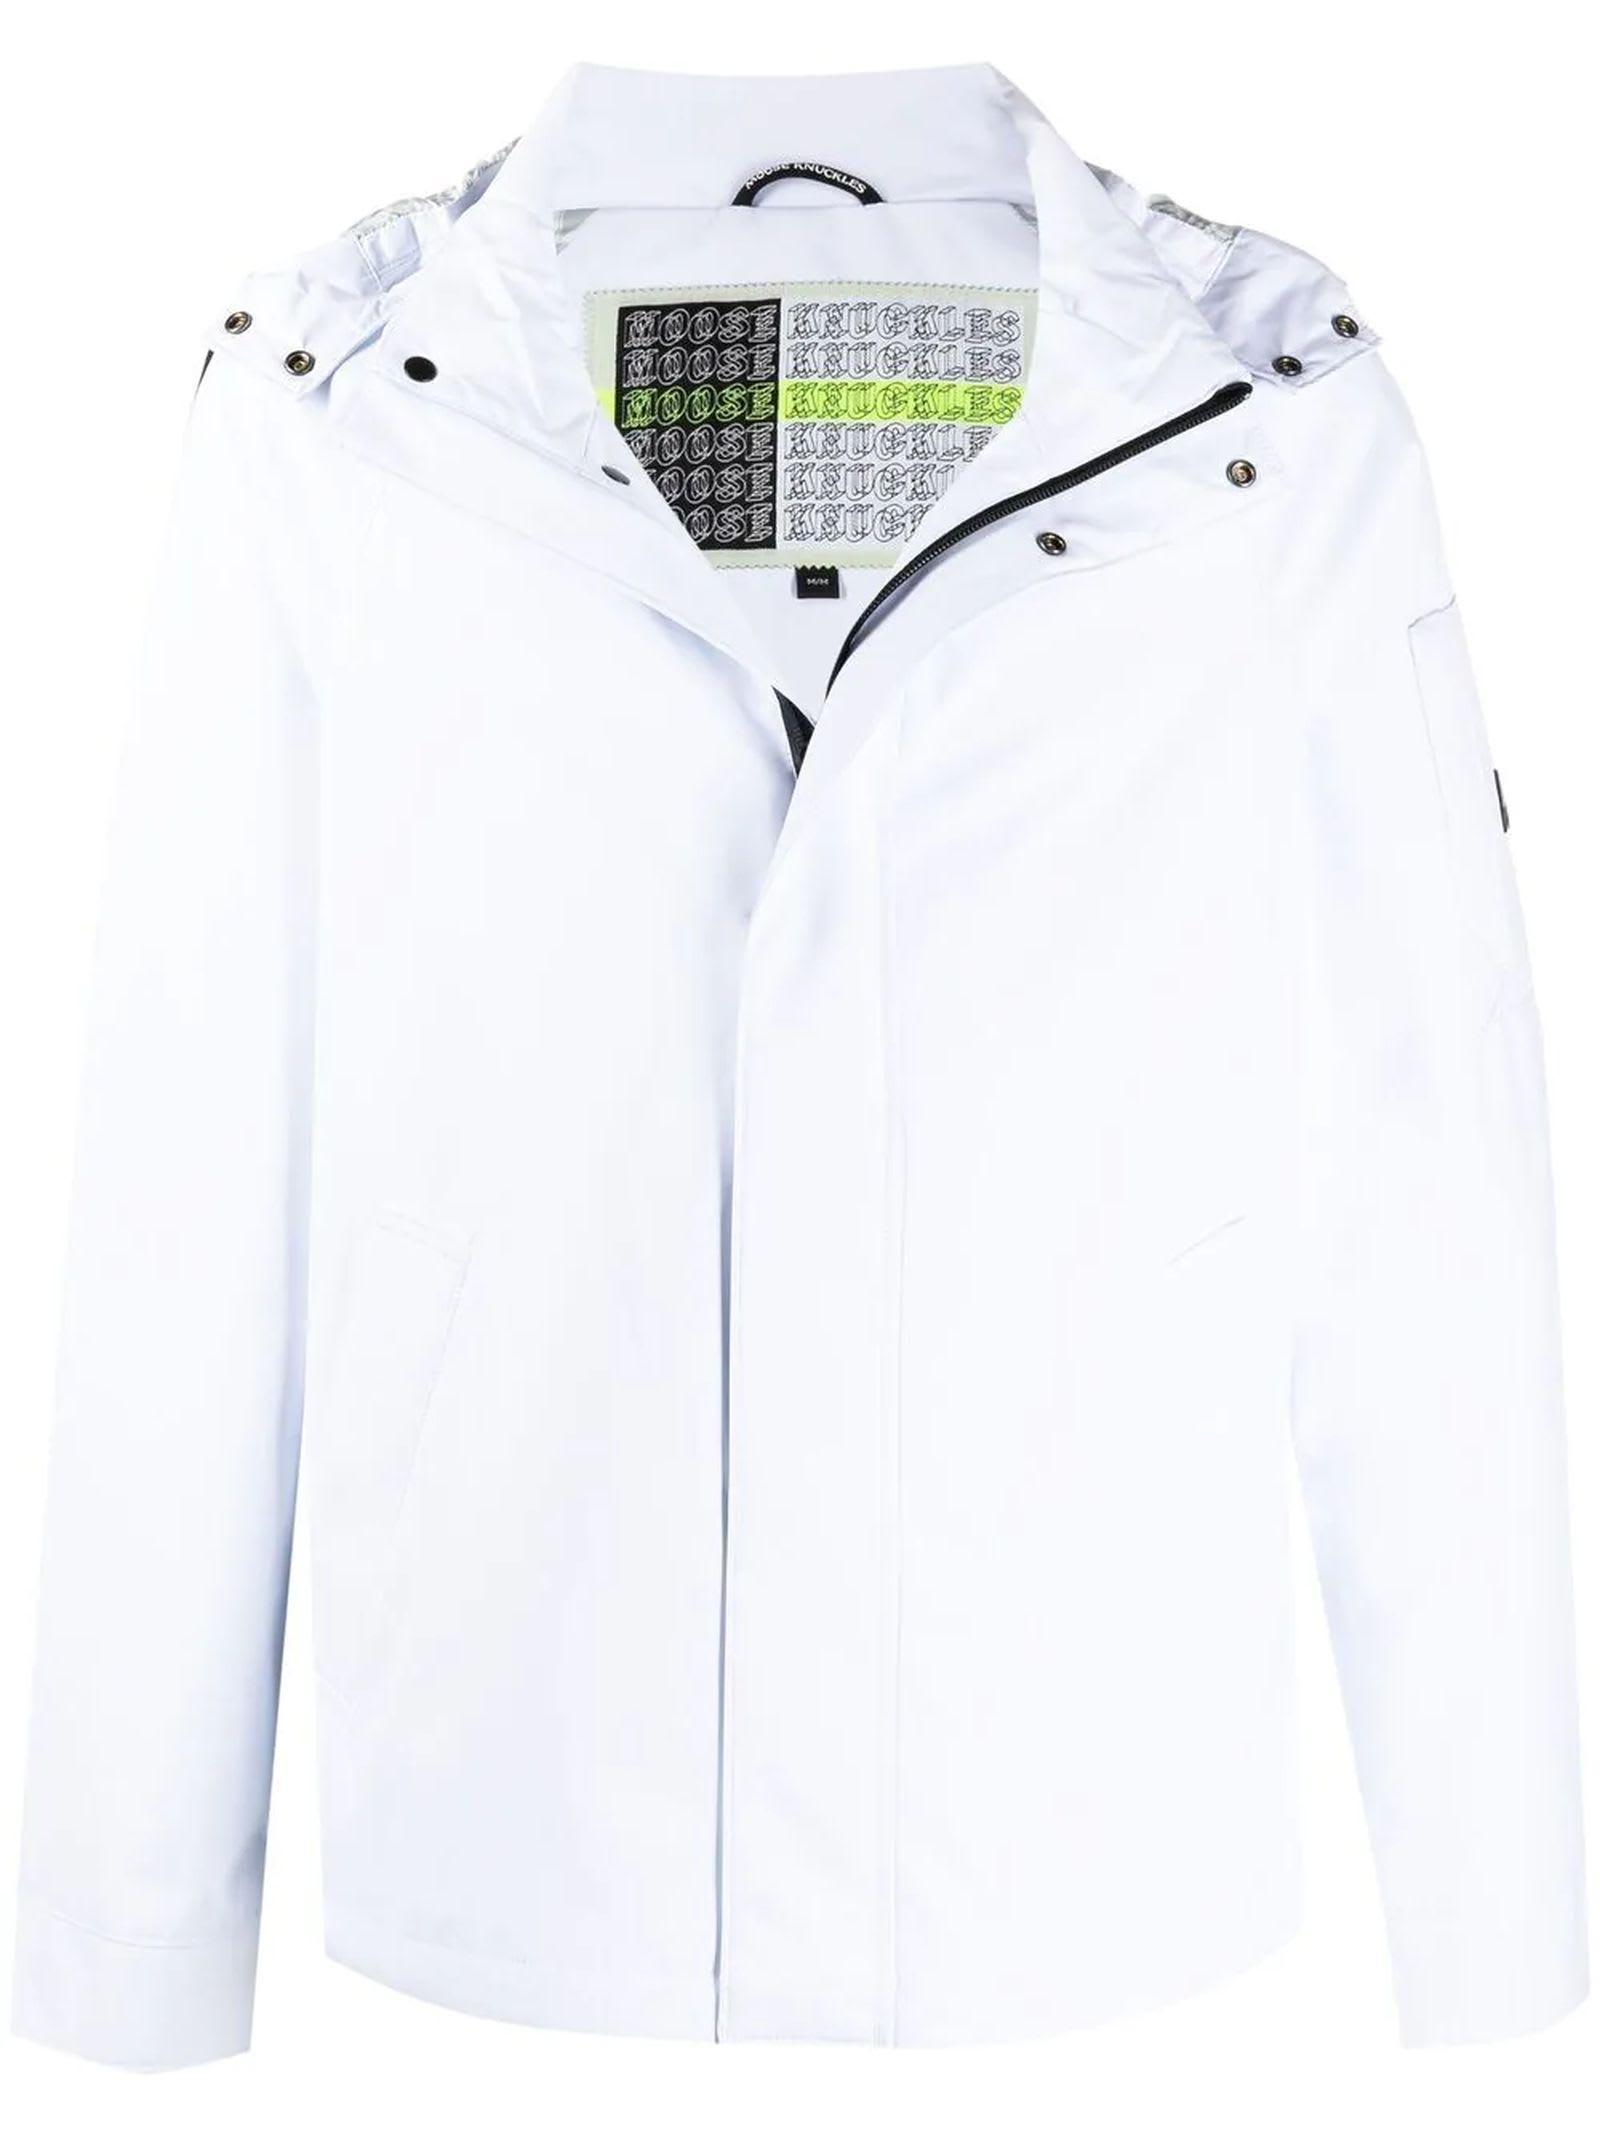 Moose Knuckles Jackets WHITE JACKET